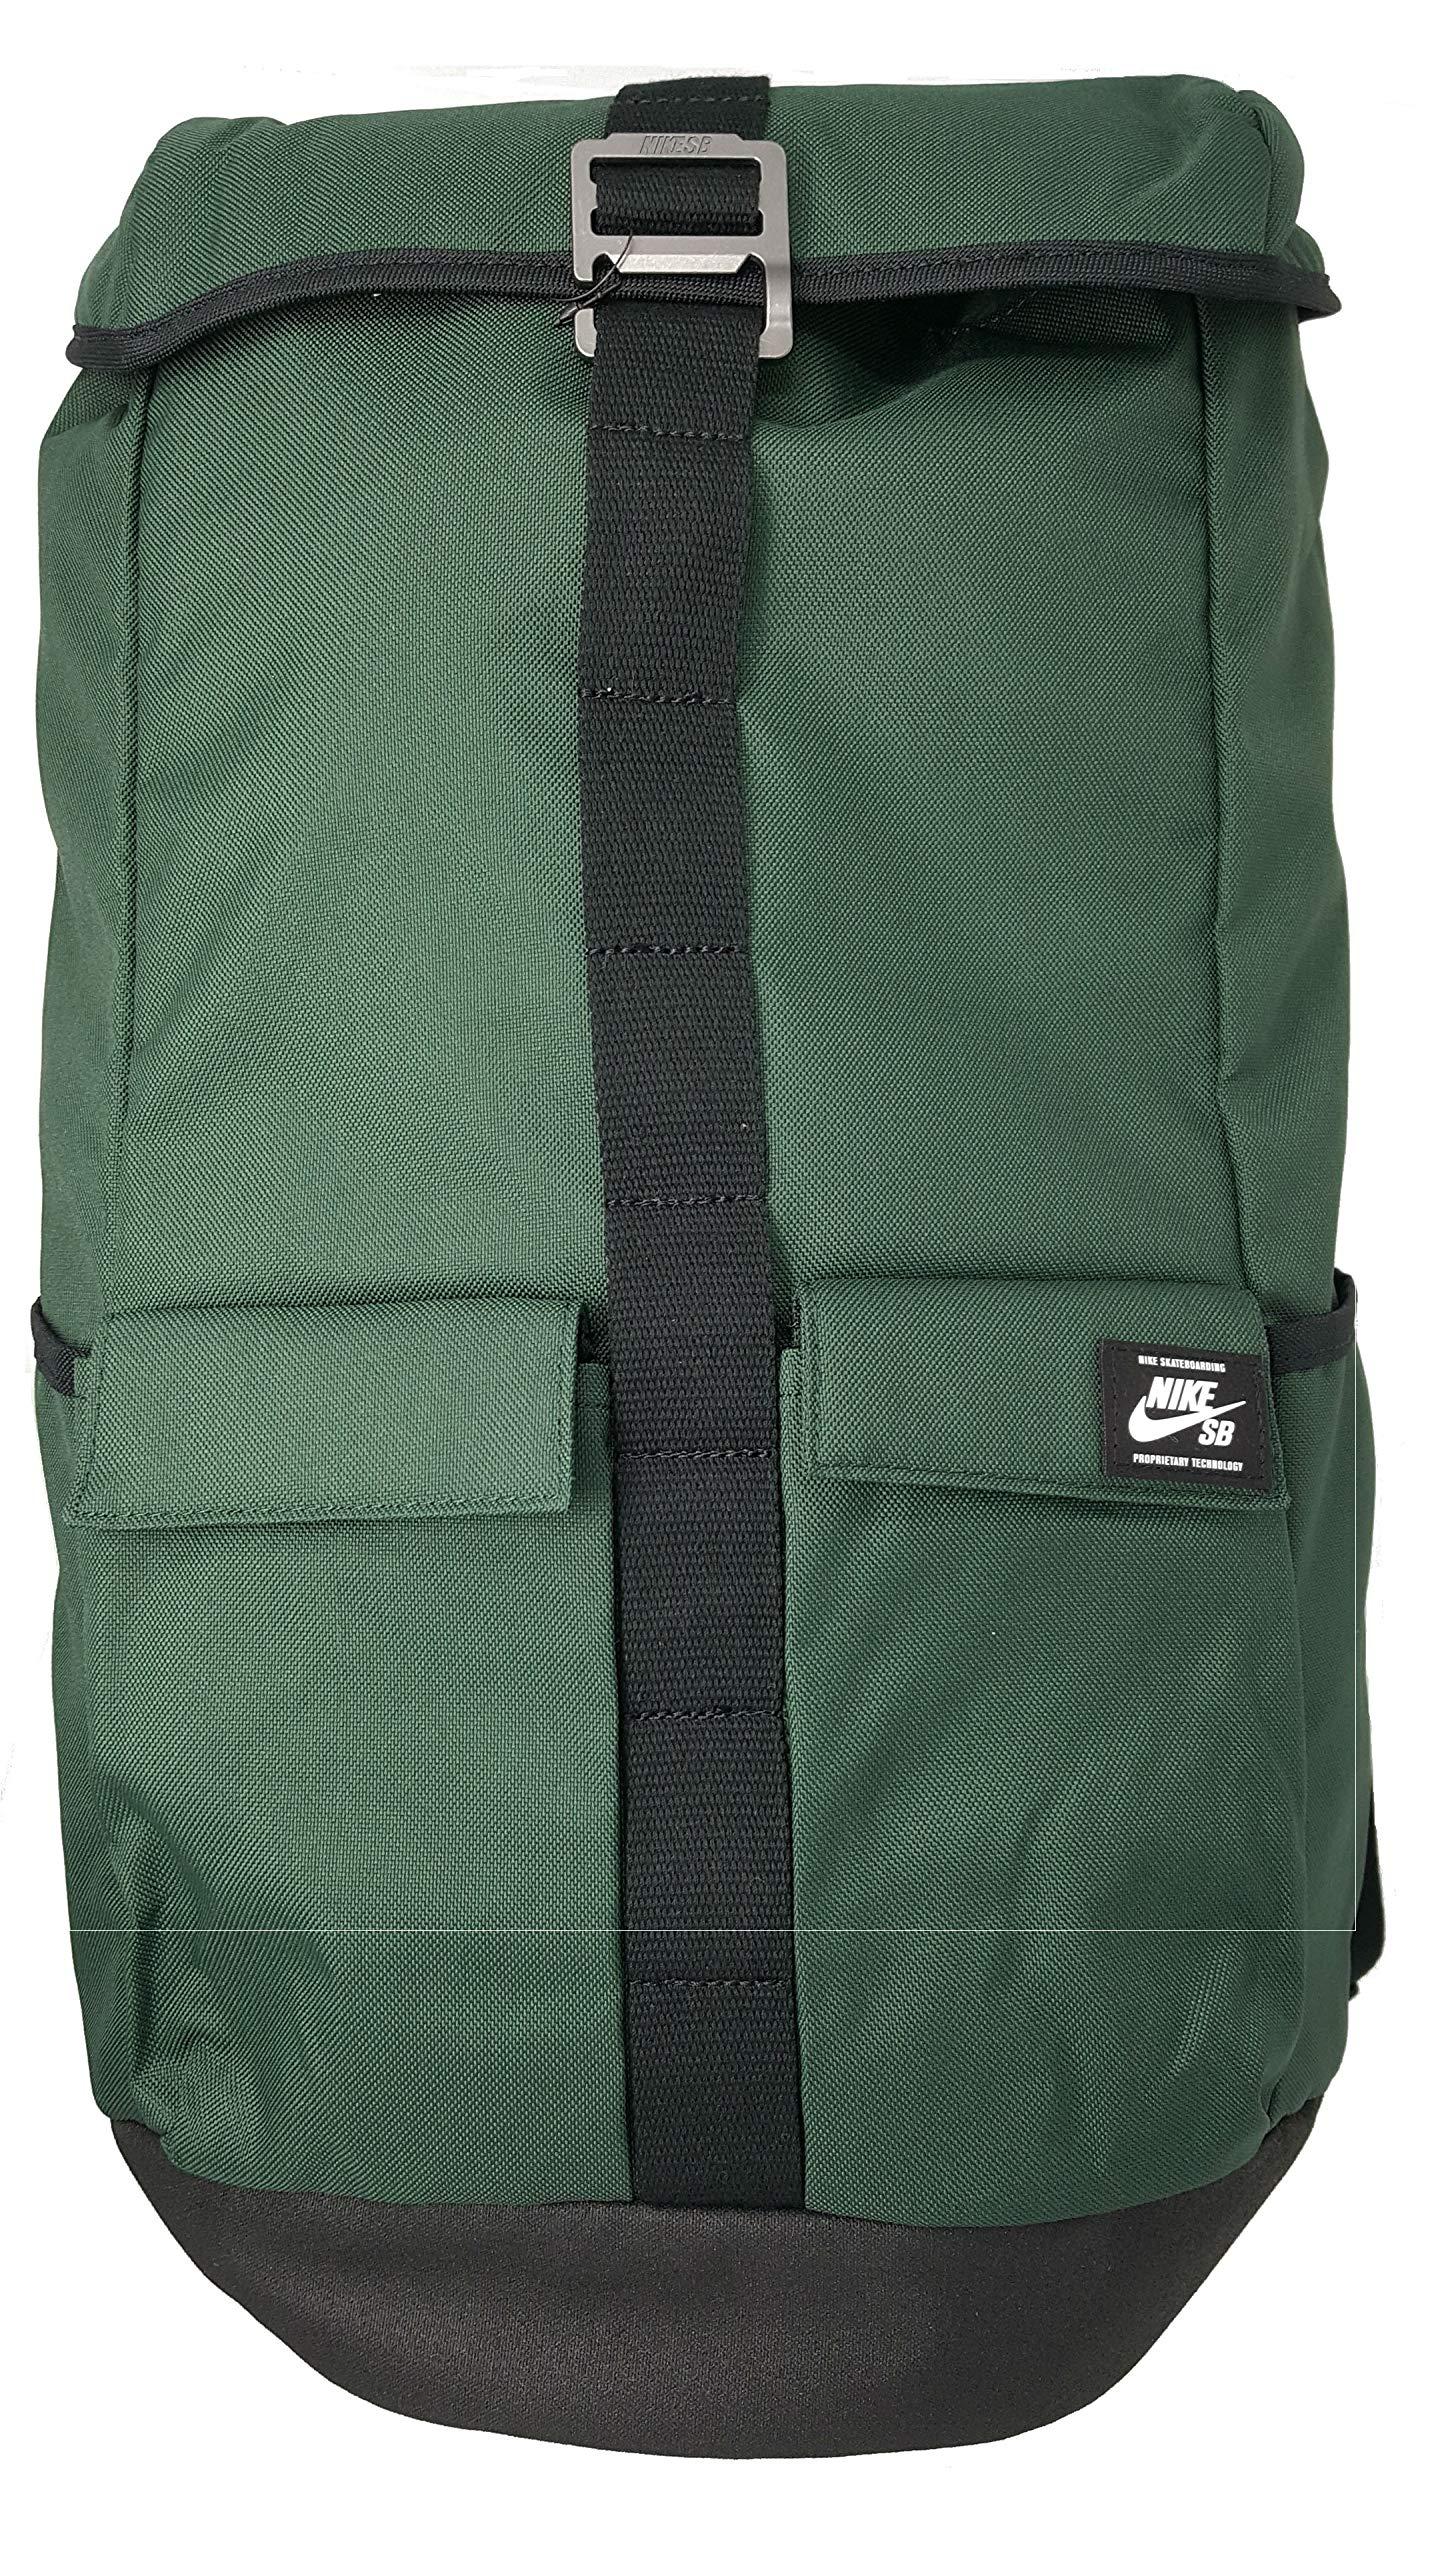 e114af8f442e Nike SB Stockwell Backpack BA5535-327 Midnight Green - Black - White